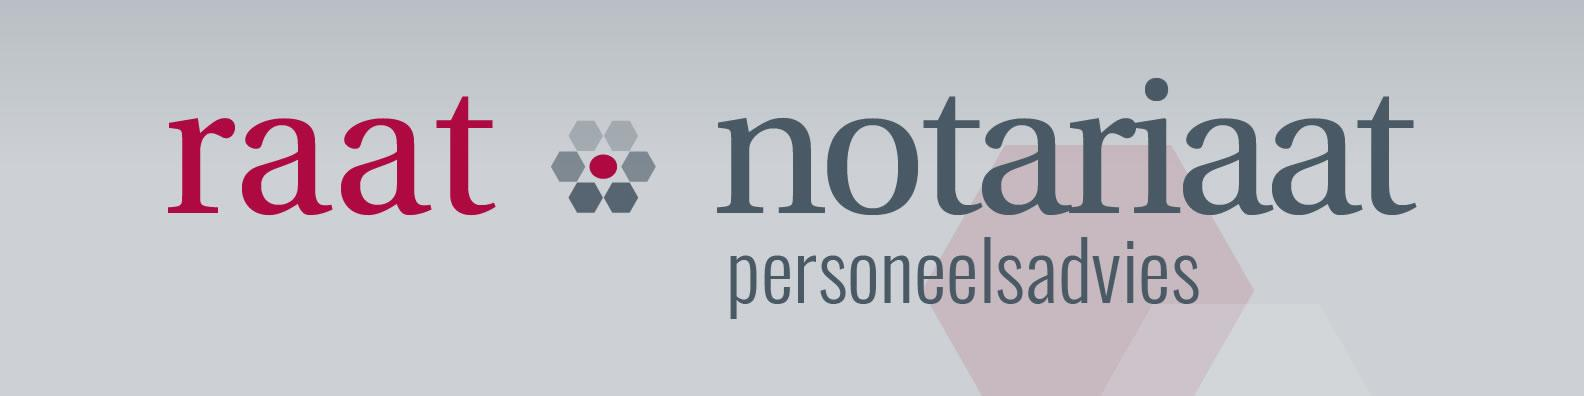 Kandidaat- notaris PFR + kandidaat-notaris OG